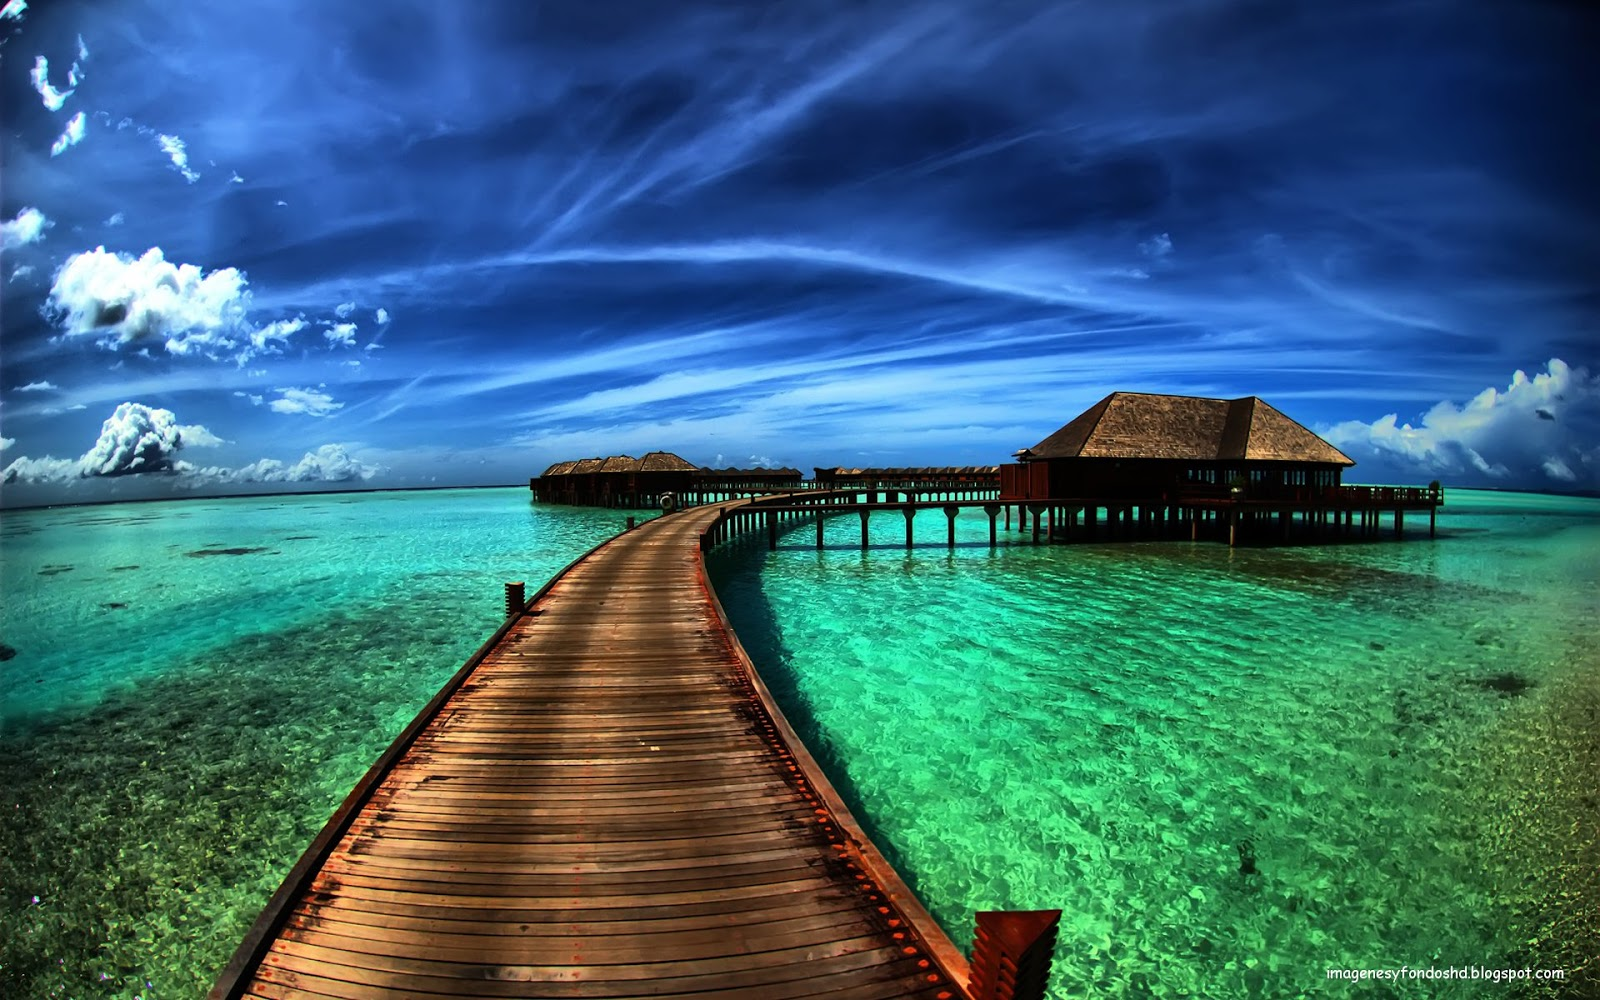 Im genes y fondos hd playa paradisiaca - Playa wallpaper ...